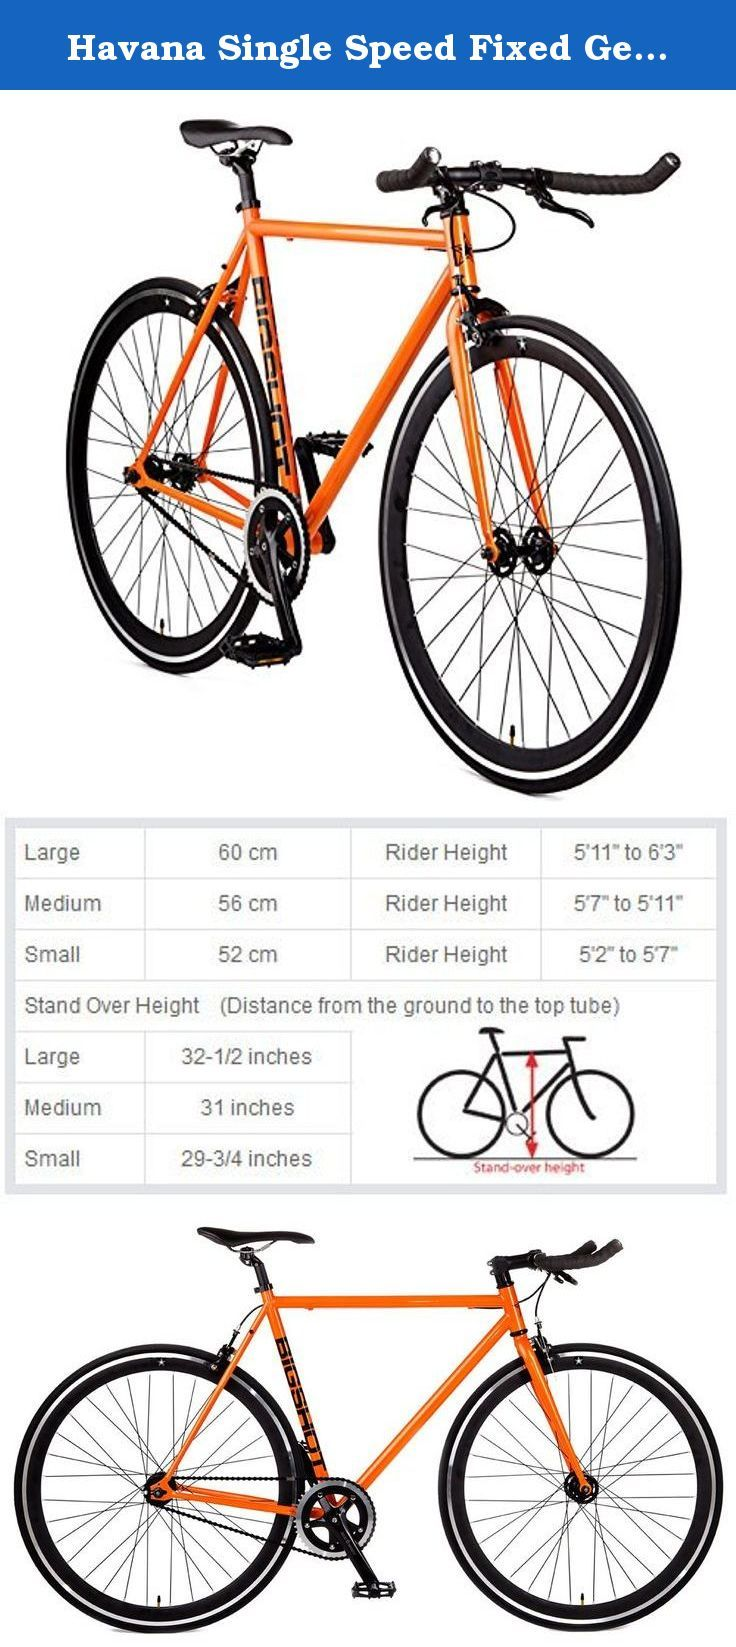 6c70ba1b41f Havana Single Speed Fixed Gear Road Bike Size: Medium 56cm - 5'7